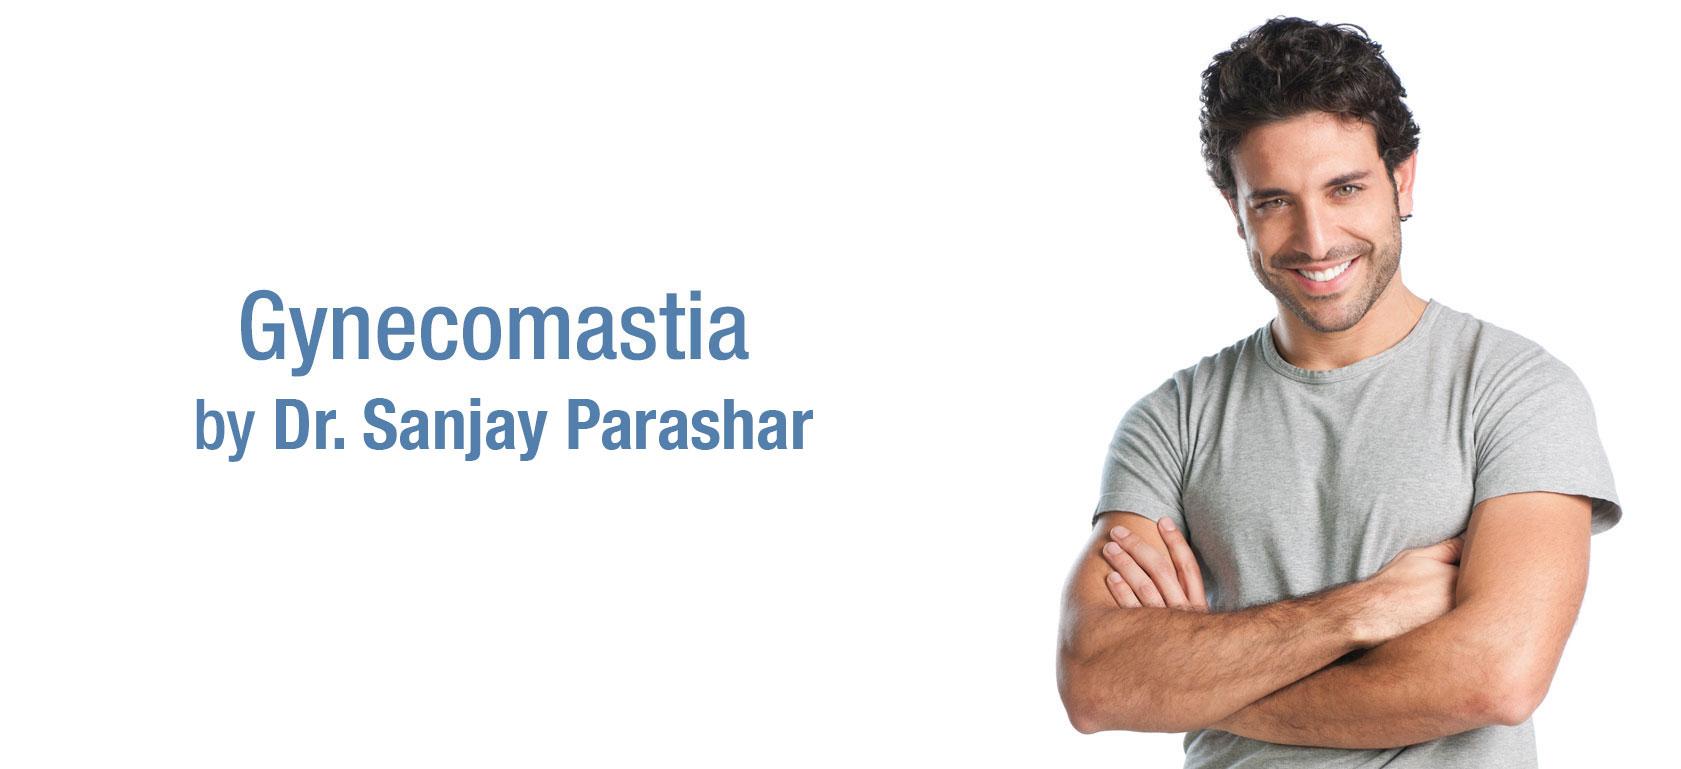 Gynecomastia Surgery Dubai - By Dr Sanjay Parashar